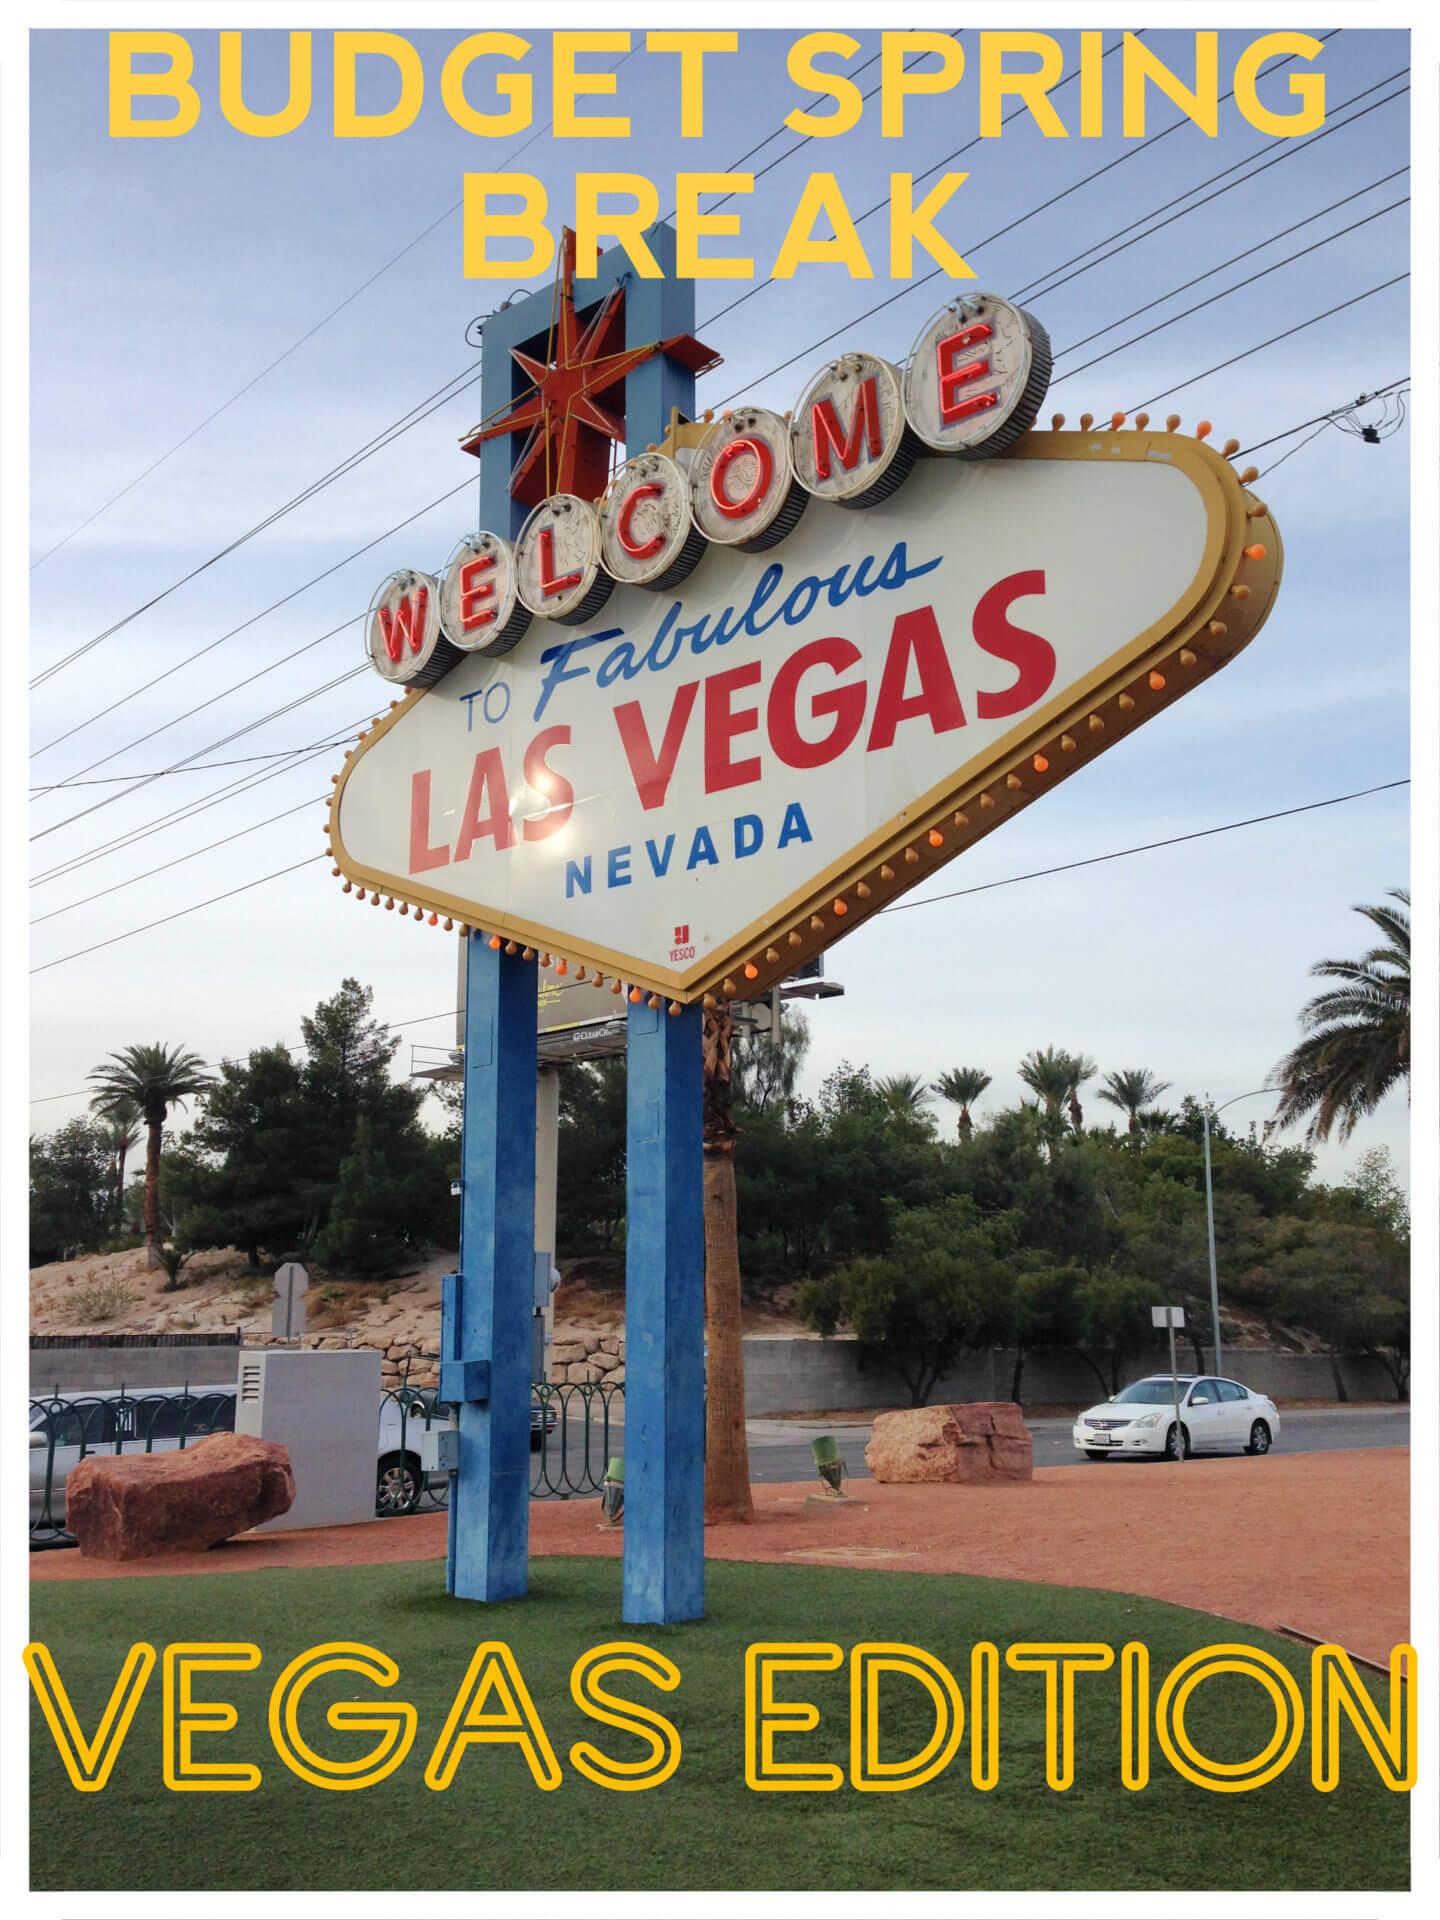 Spring Break! Vegas edition